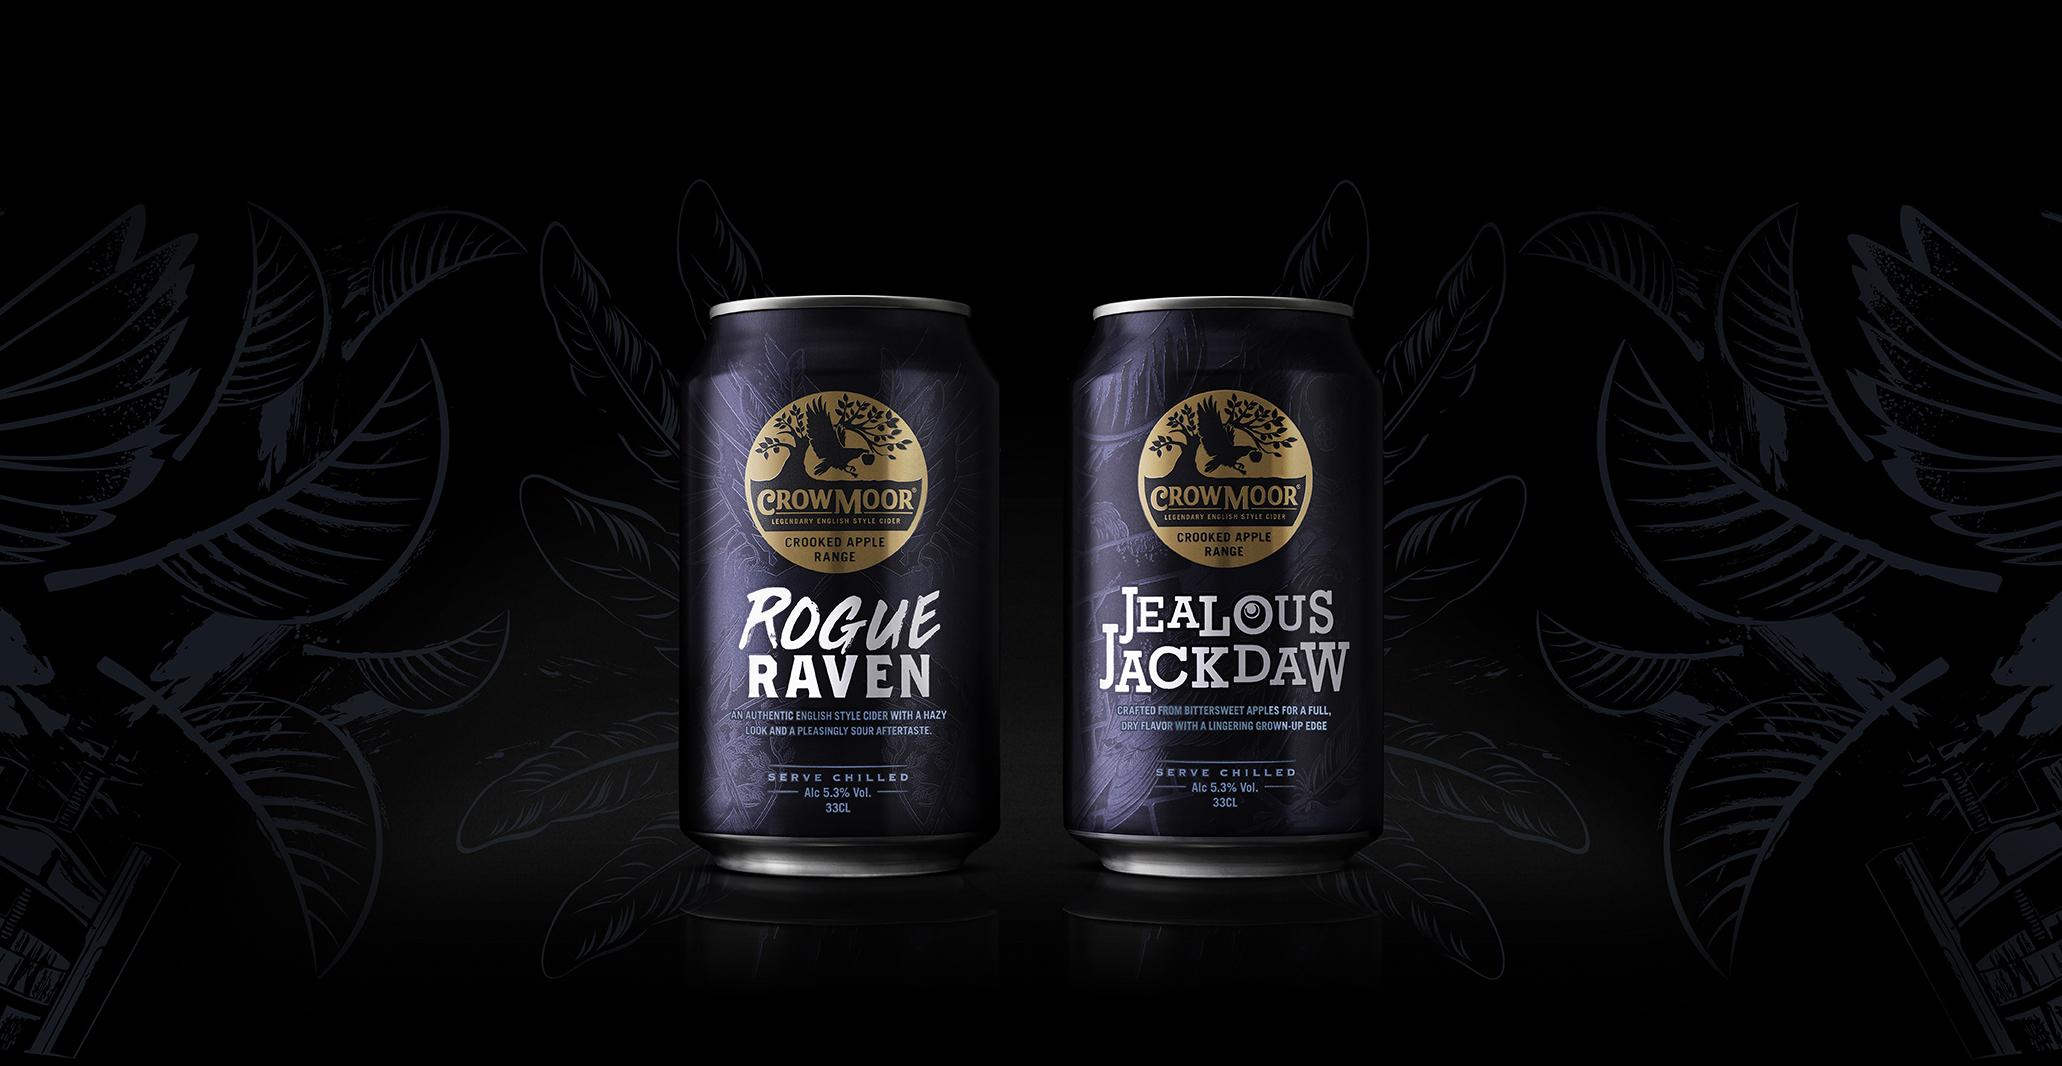 Bluemarlin's Legendary Rebrand of Crowmoor Cider / World Brand and Packaging Design Society